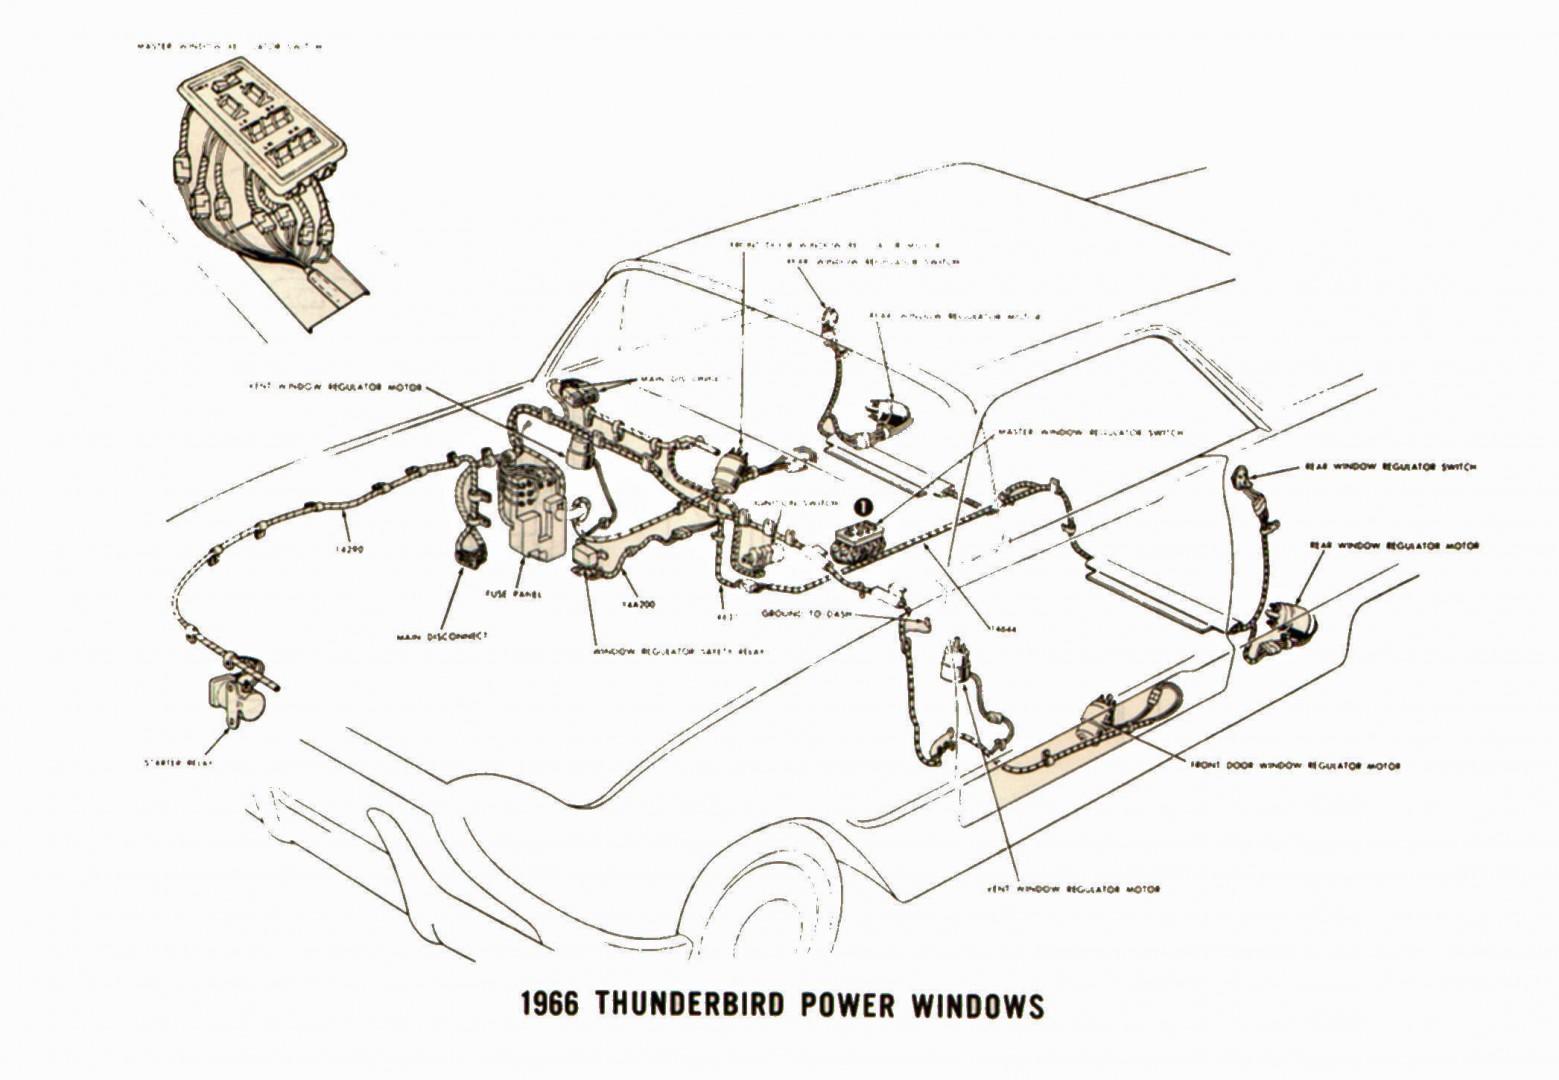 1966 thunderbird power window wiring diagram